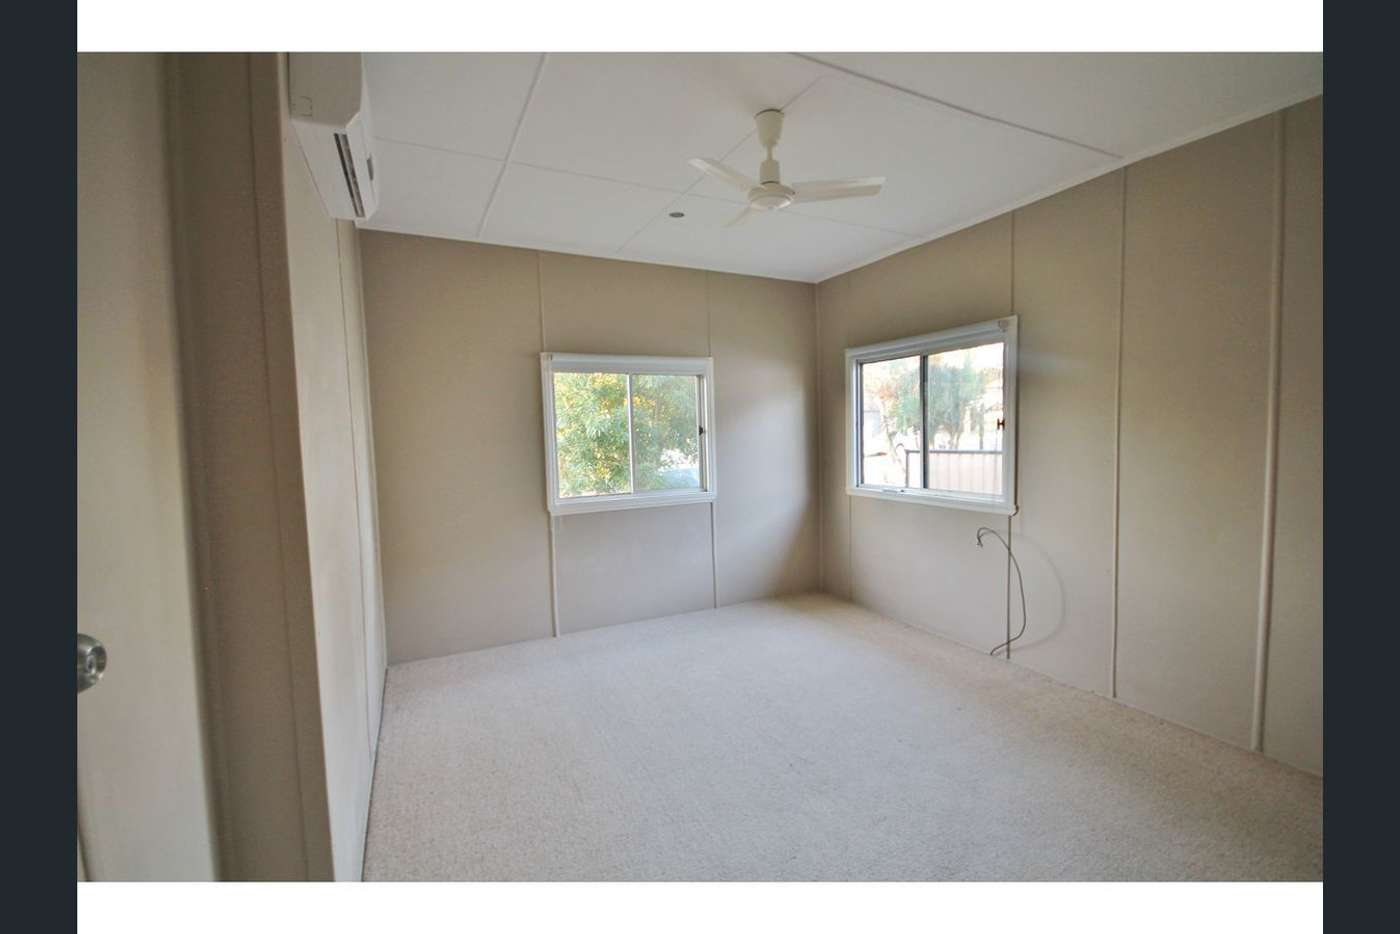 Seventh view of Homely house listing, 95 Hertford Street, Upper Mount Gravatt QLD 4122